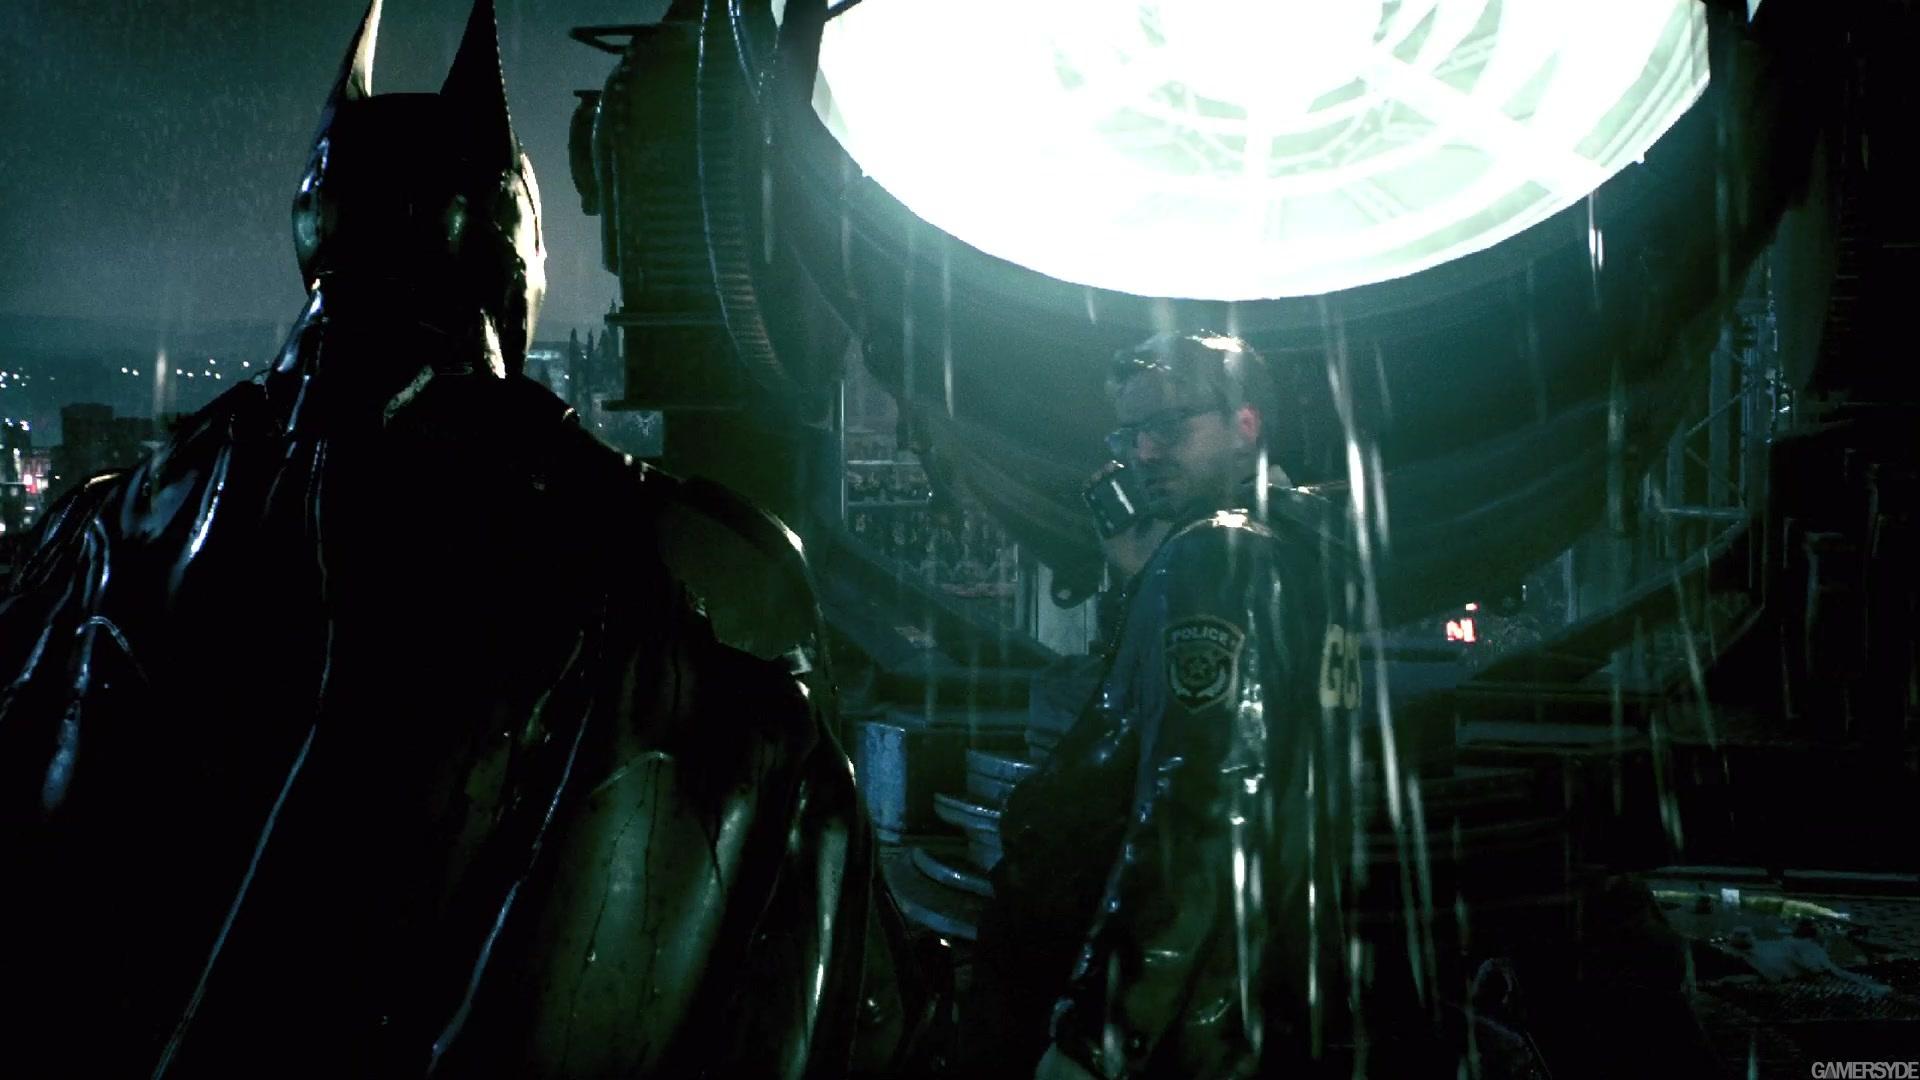 image batman arkham knight 25050 2899 0011 اولین تریلر گیم پلی Batman : Arkham Knight منتشر شد : حماسه ی نهایی